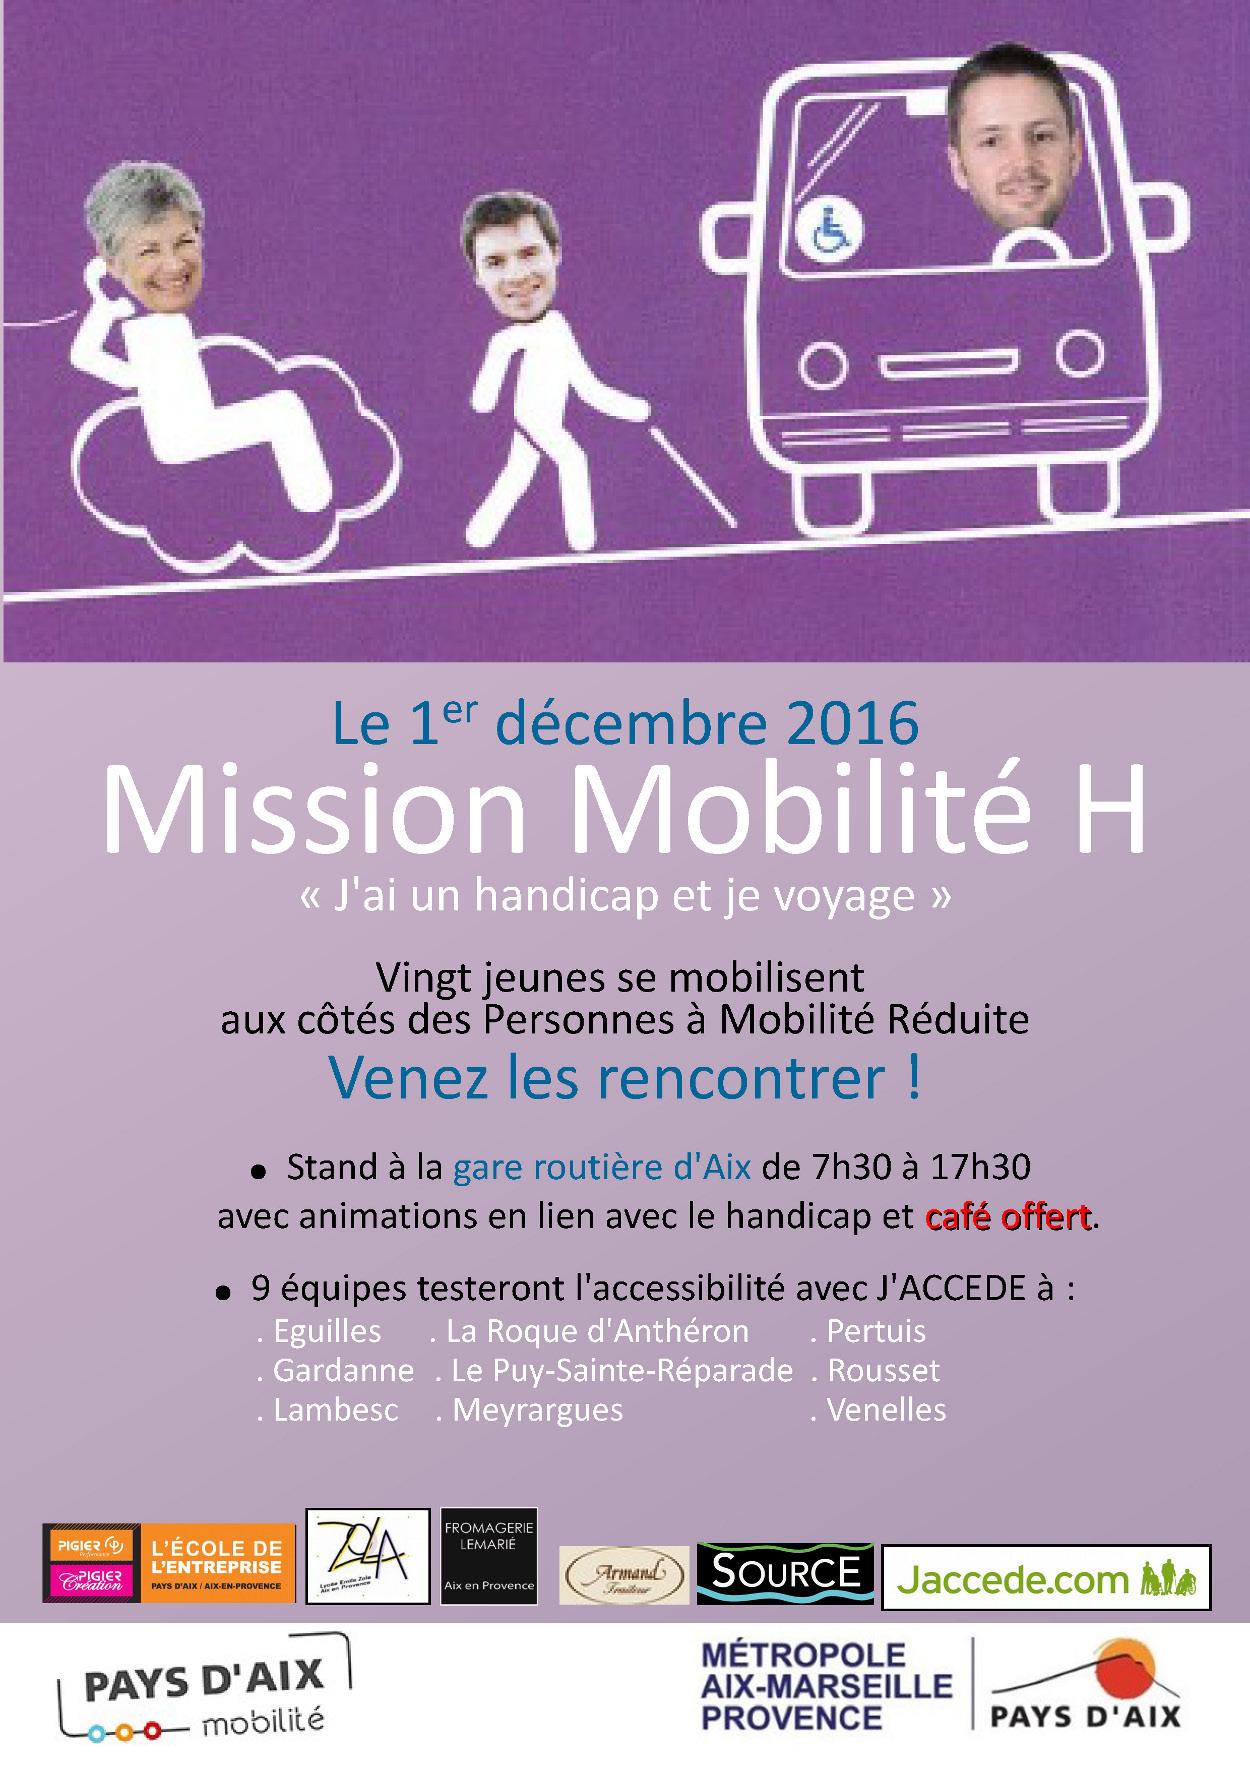 mission-mobilite-h